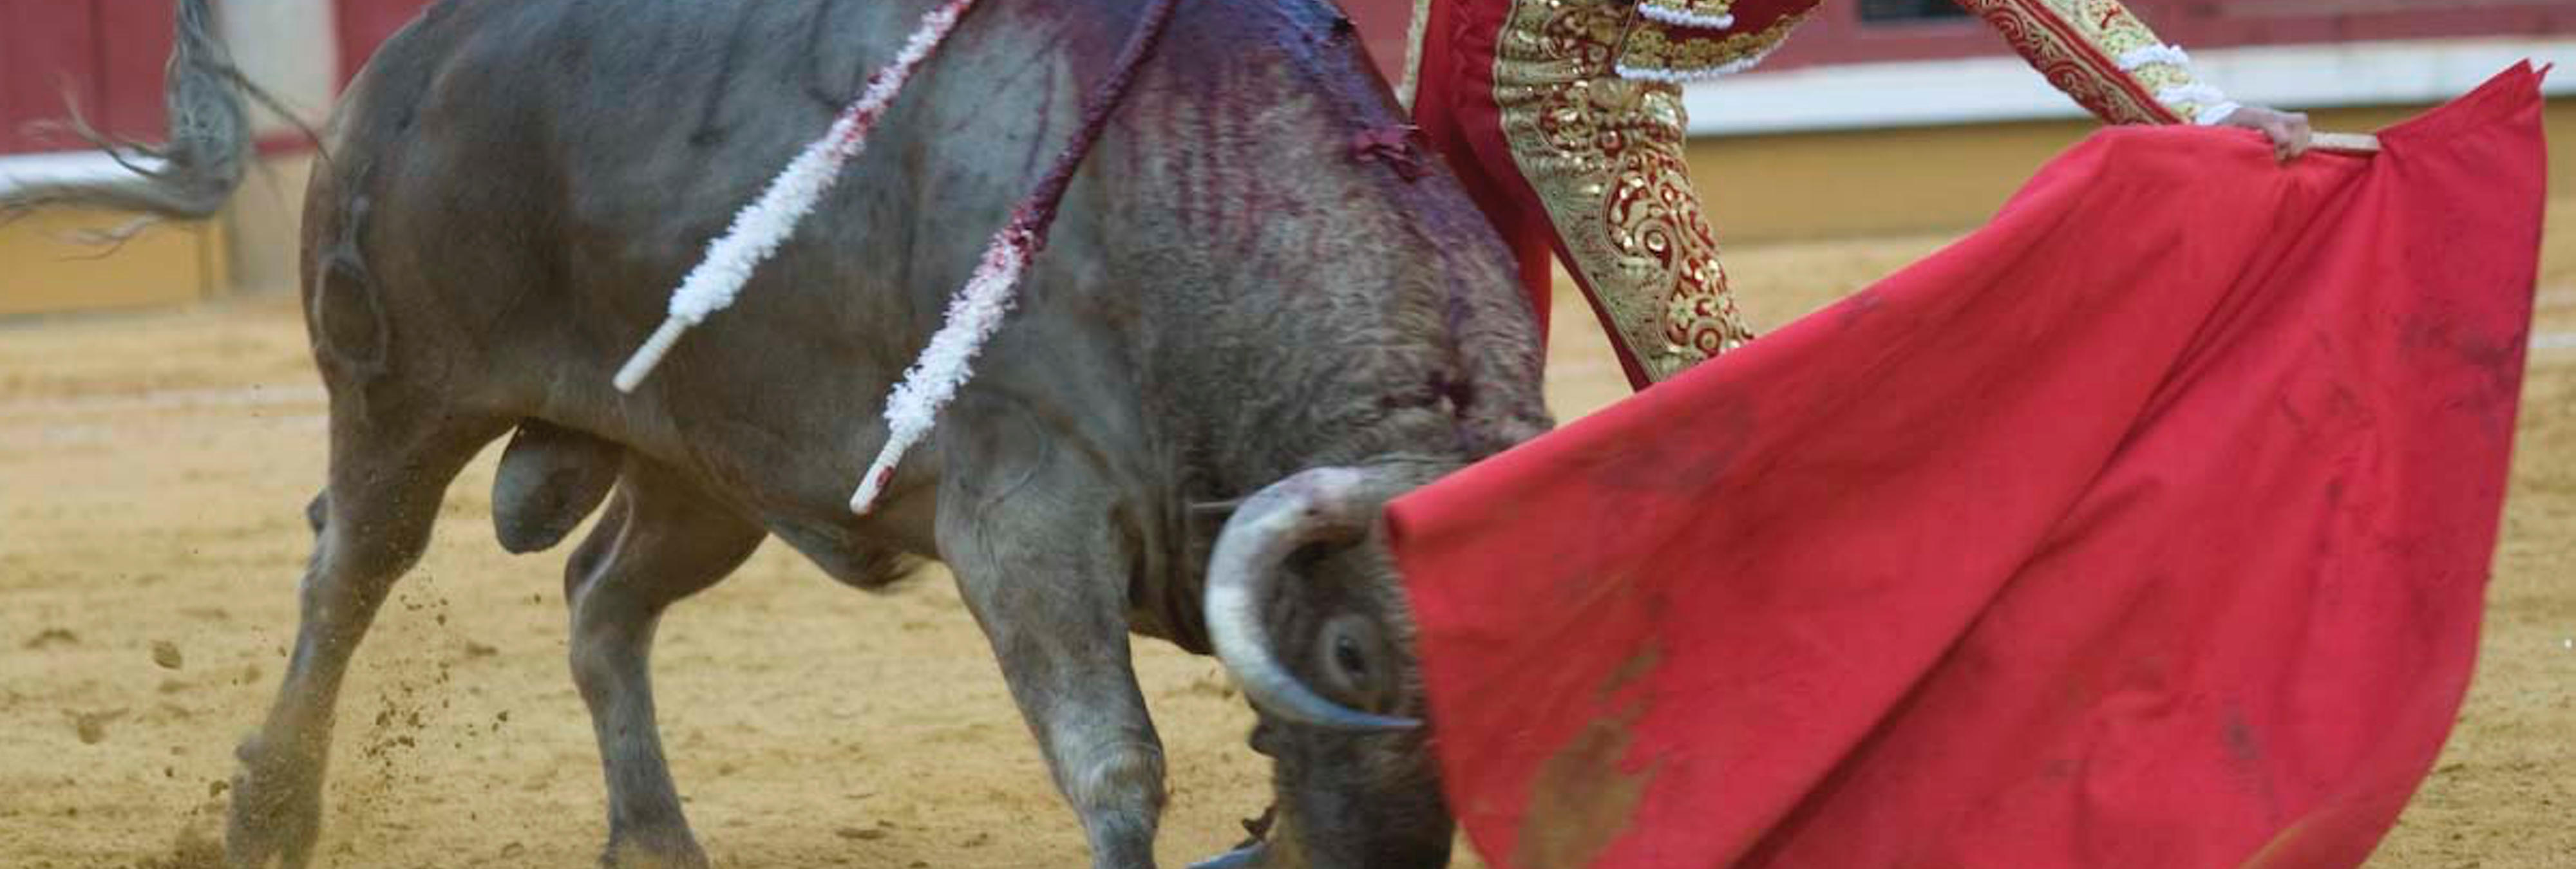 El Parlamento Europeo plantea prohibir la tauromaquia en España